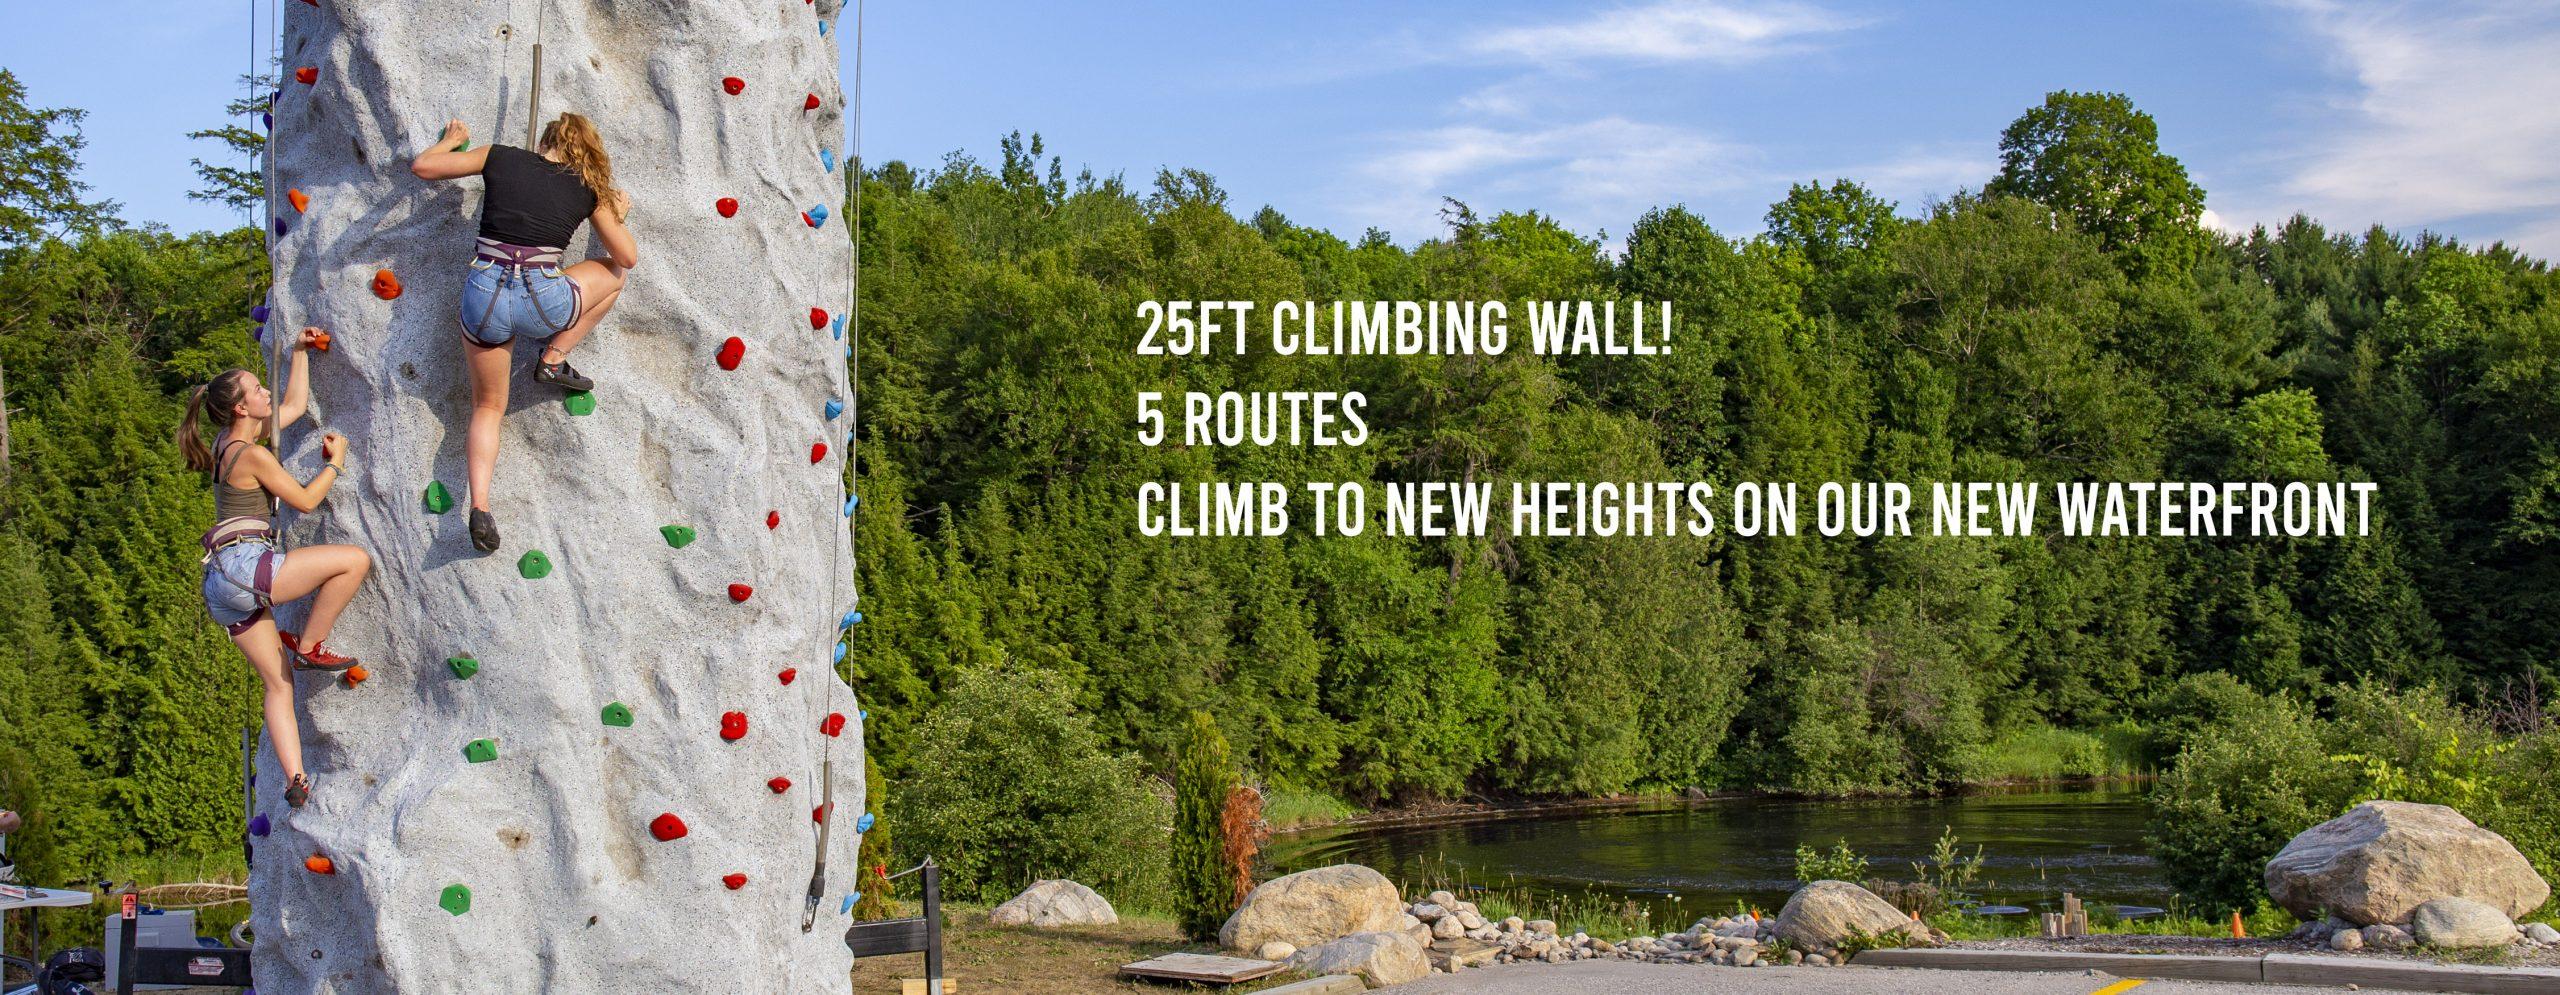 Muskoka Climbing Wall